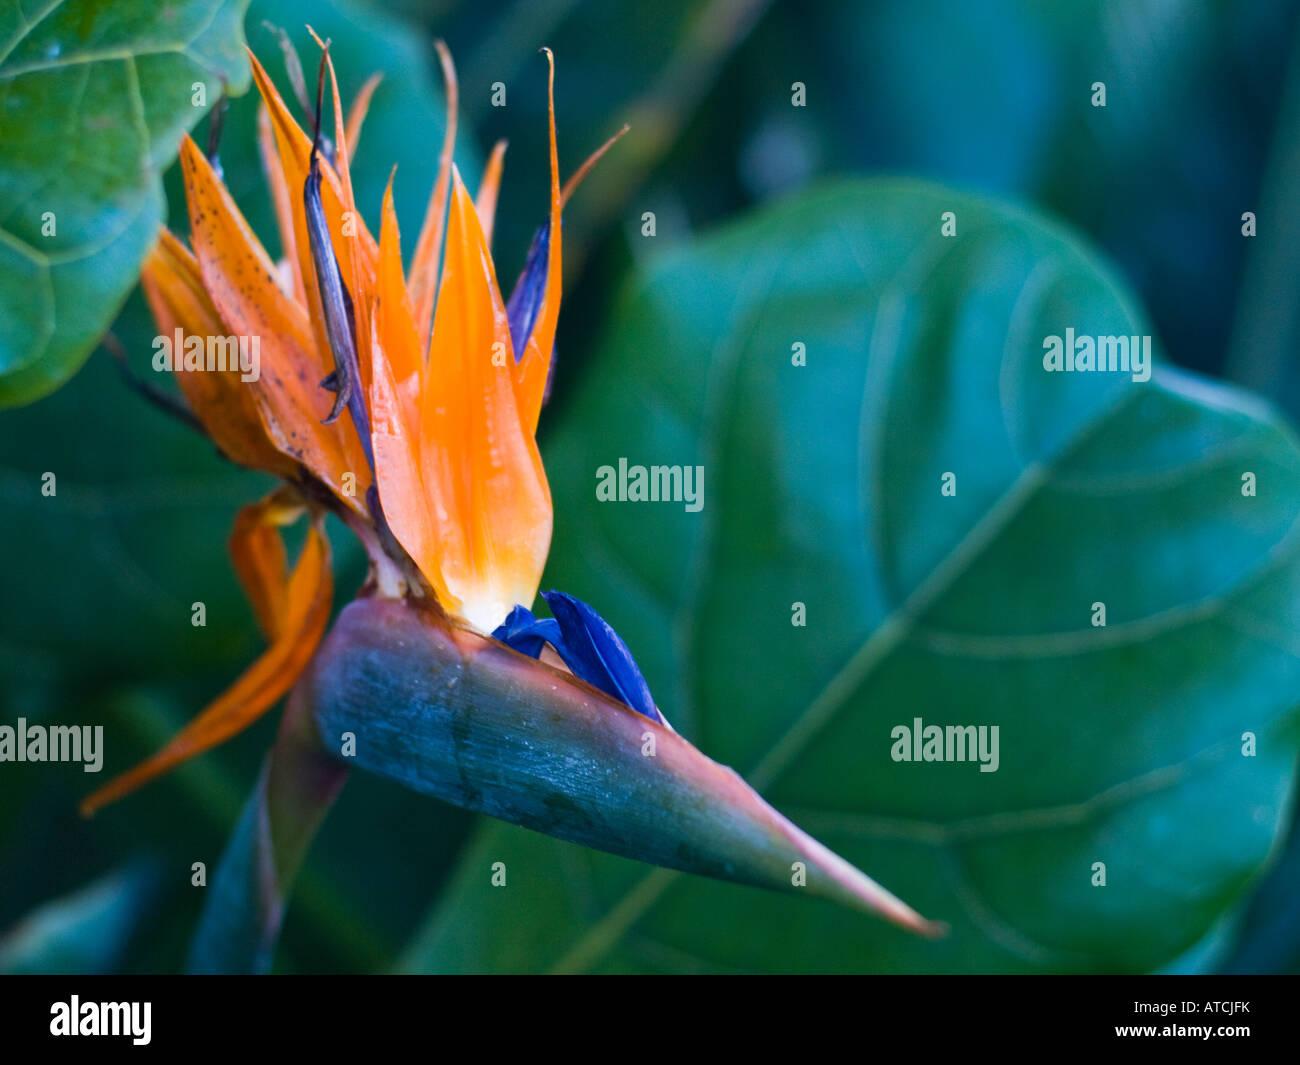 A Bird of Paradise flower. - Stock Image